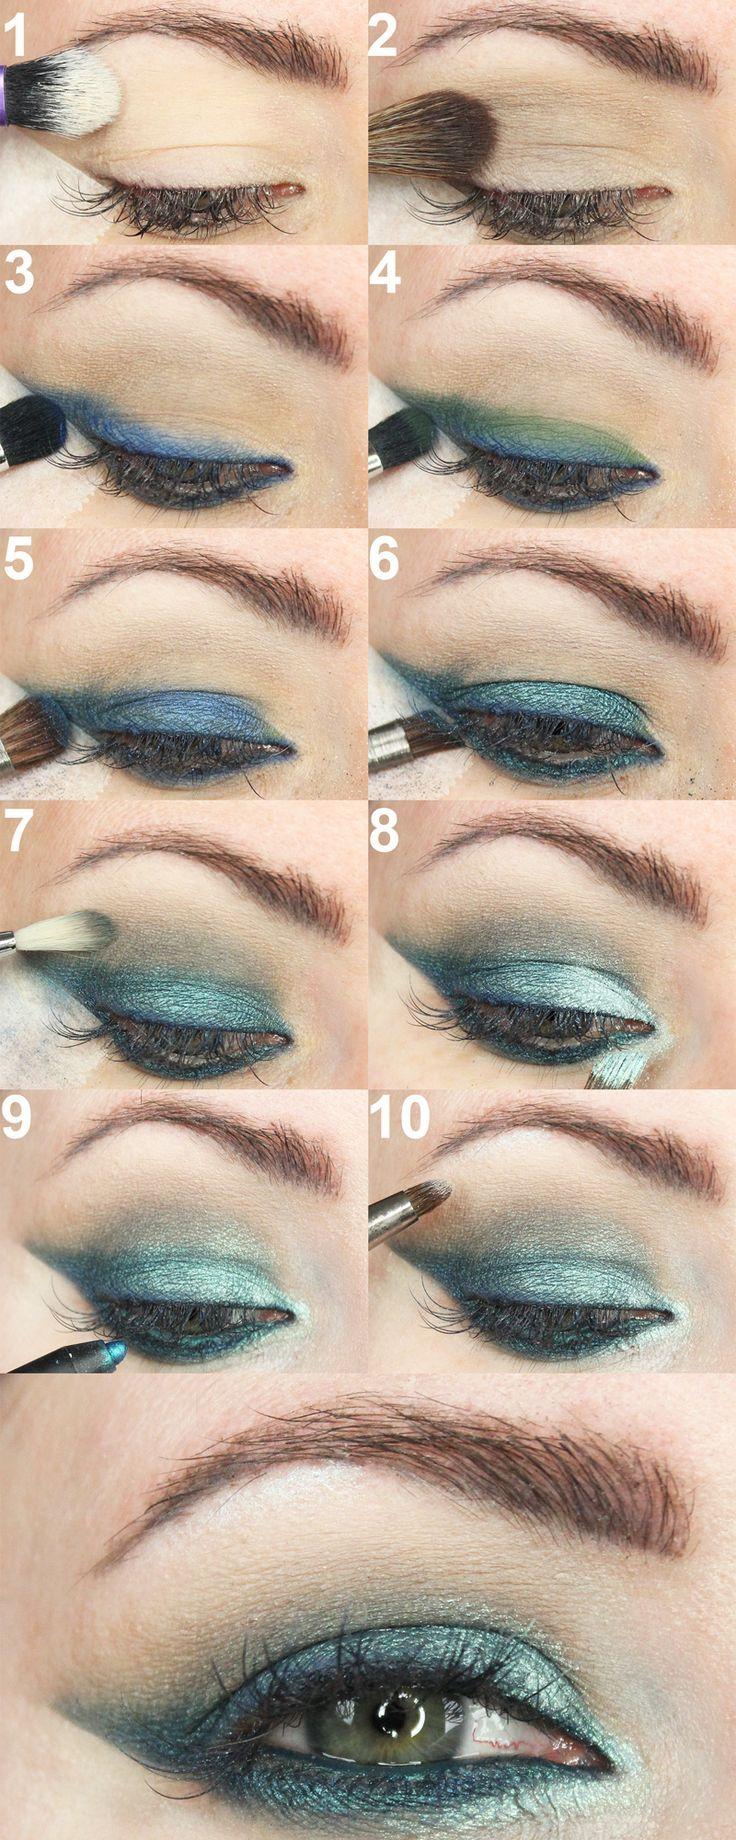 Kat von d metalmatte tutorial smoky teal hooded eye makeup kat von d metalmatte tutorial smoky teal hooded eye makeup tutorial baditri Gallery